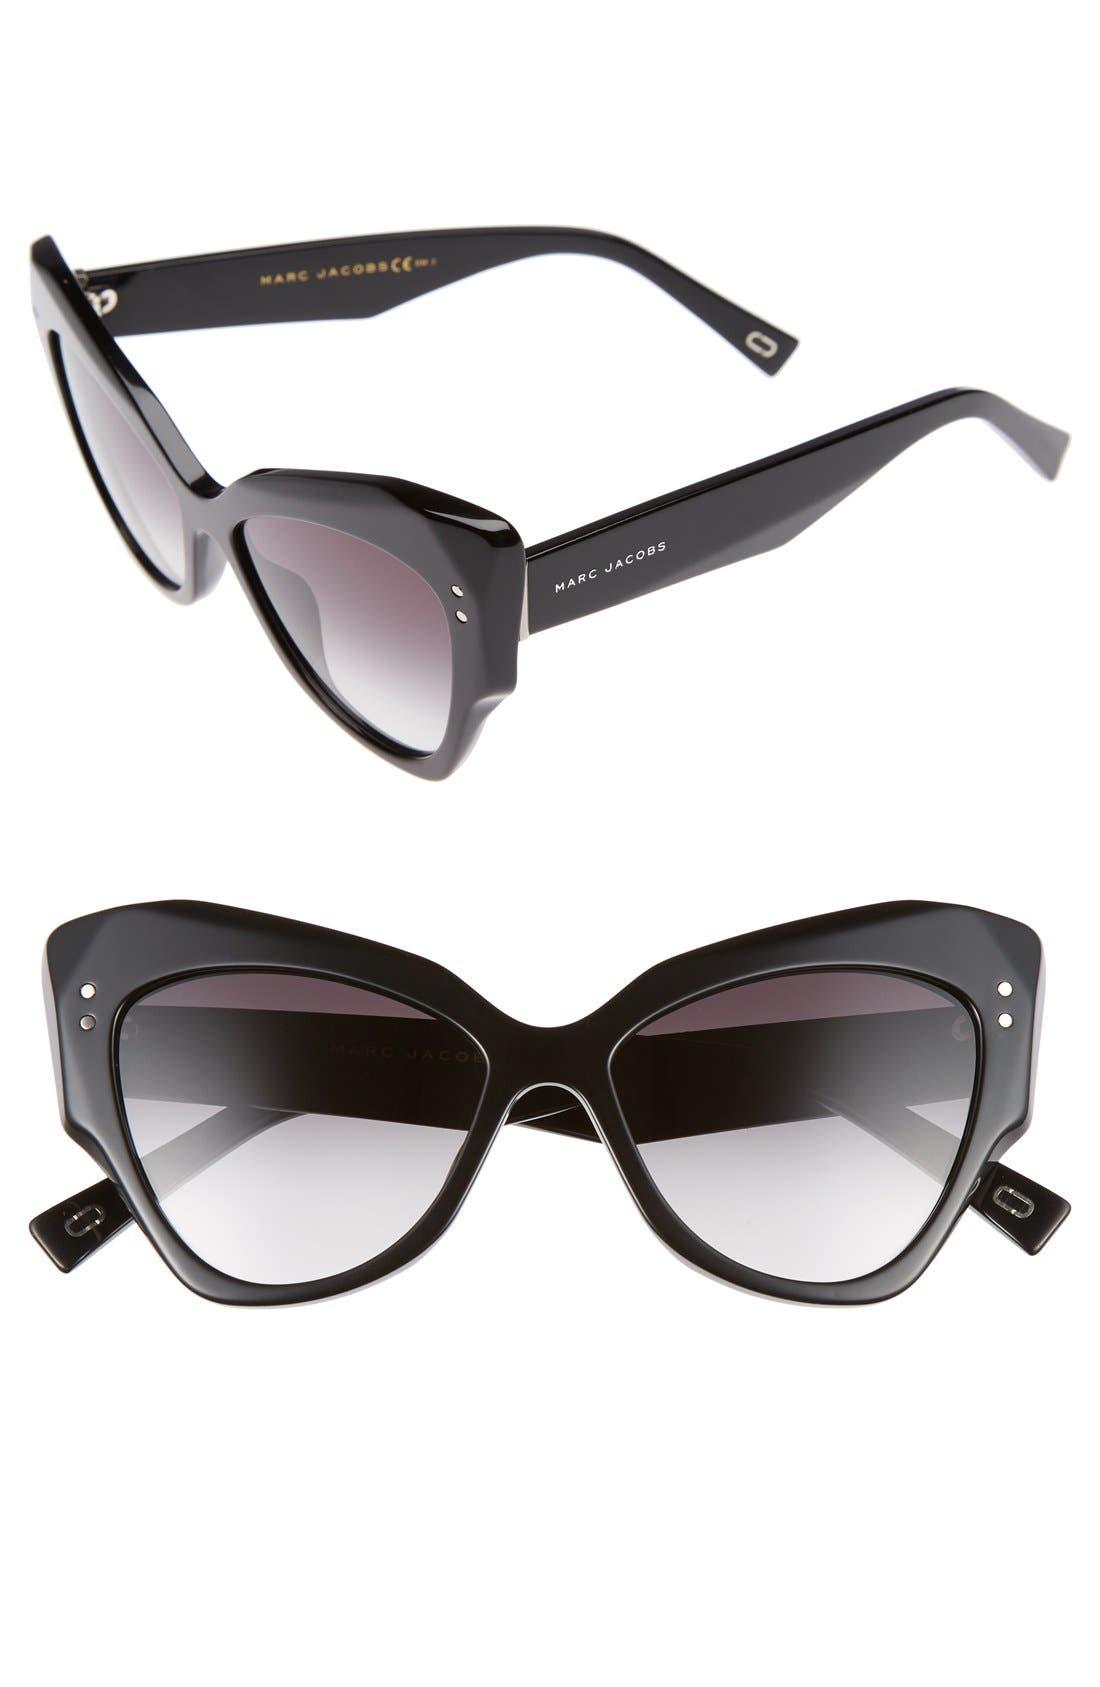 Main Image - MARC JACOBS 52mm Cat Eye Sunglasses